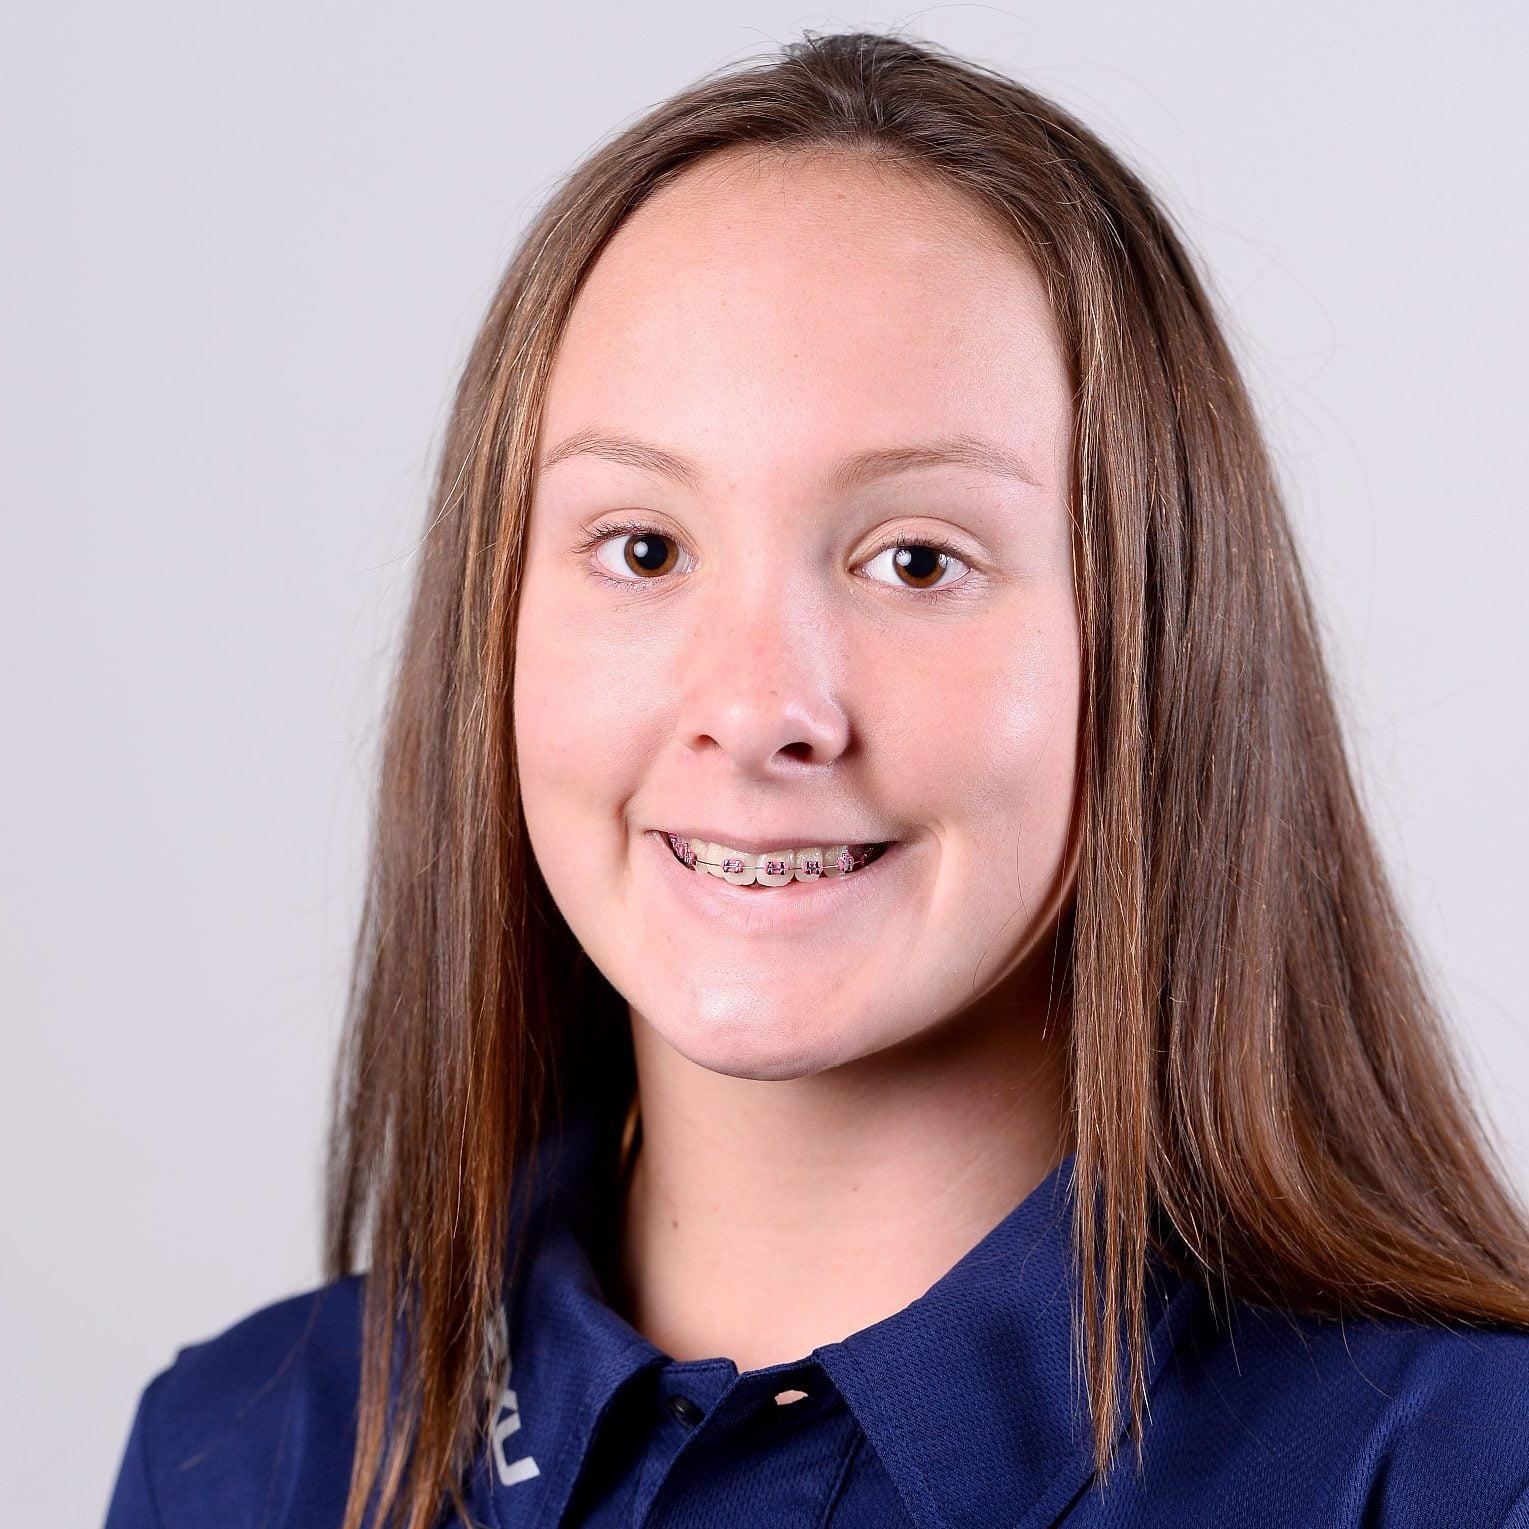 Paige Leonhardt